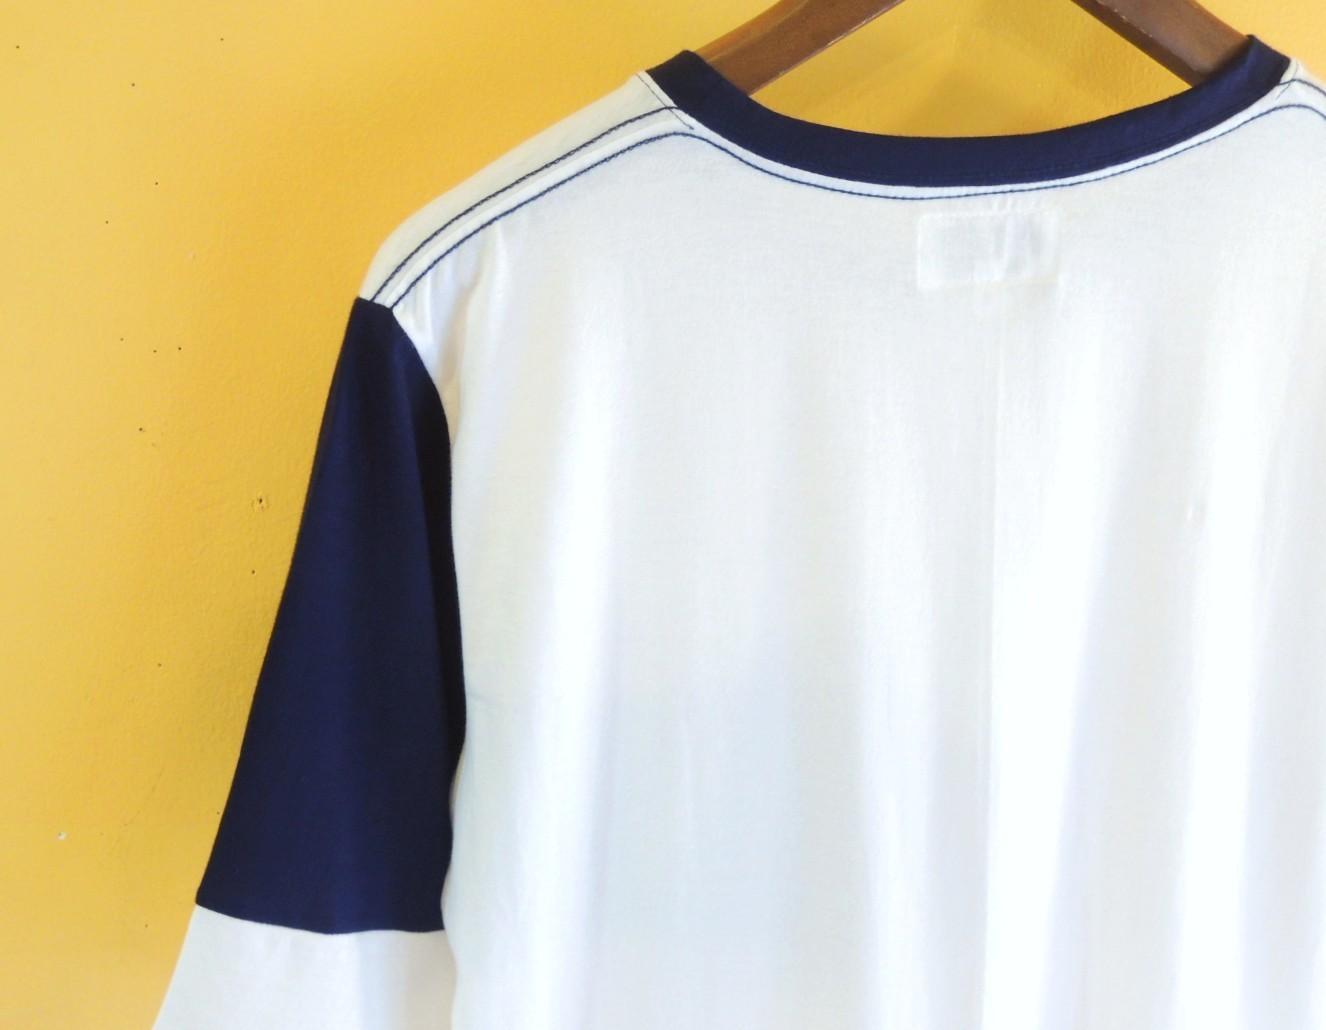 pyjamaclothing2tonepockettshirts05.JPG